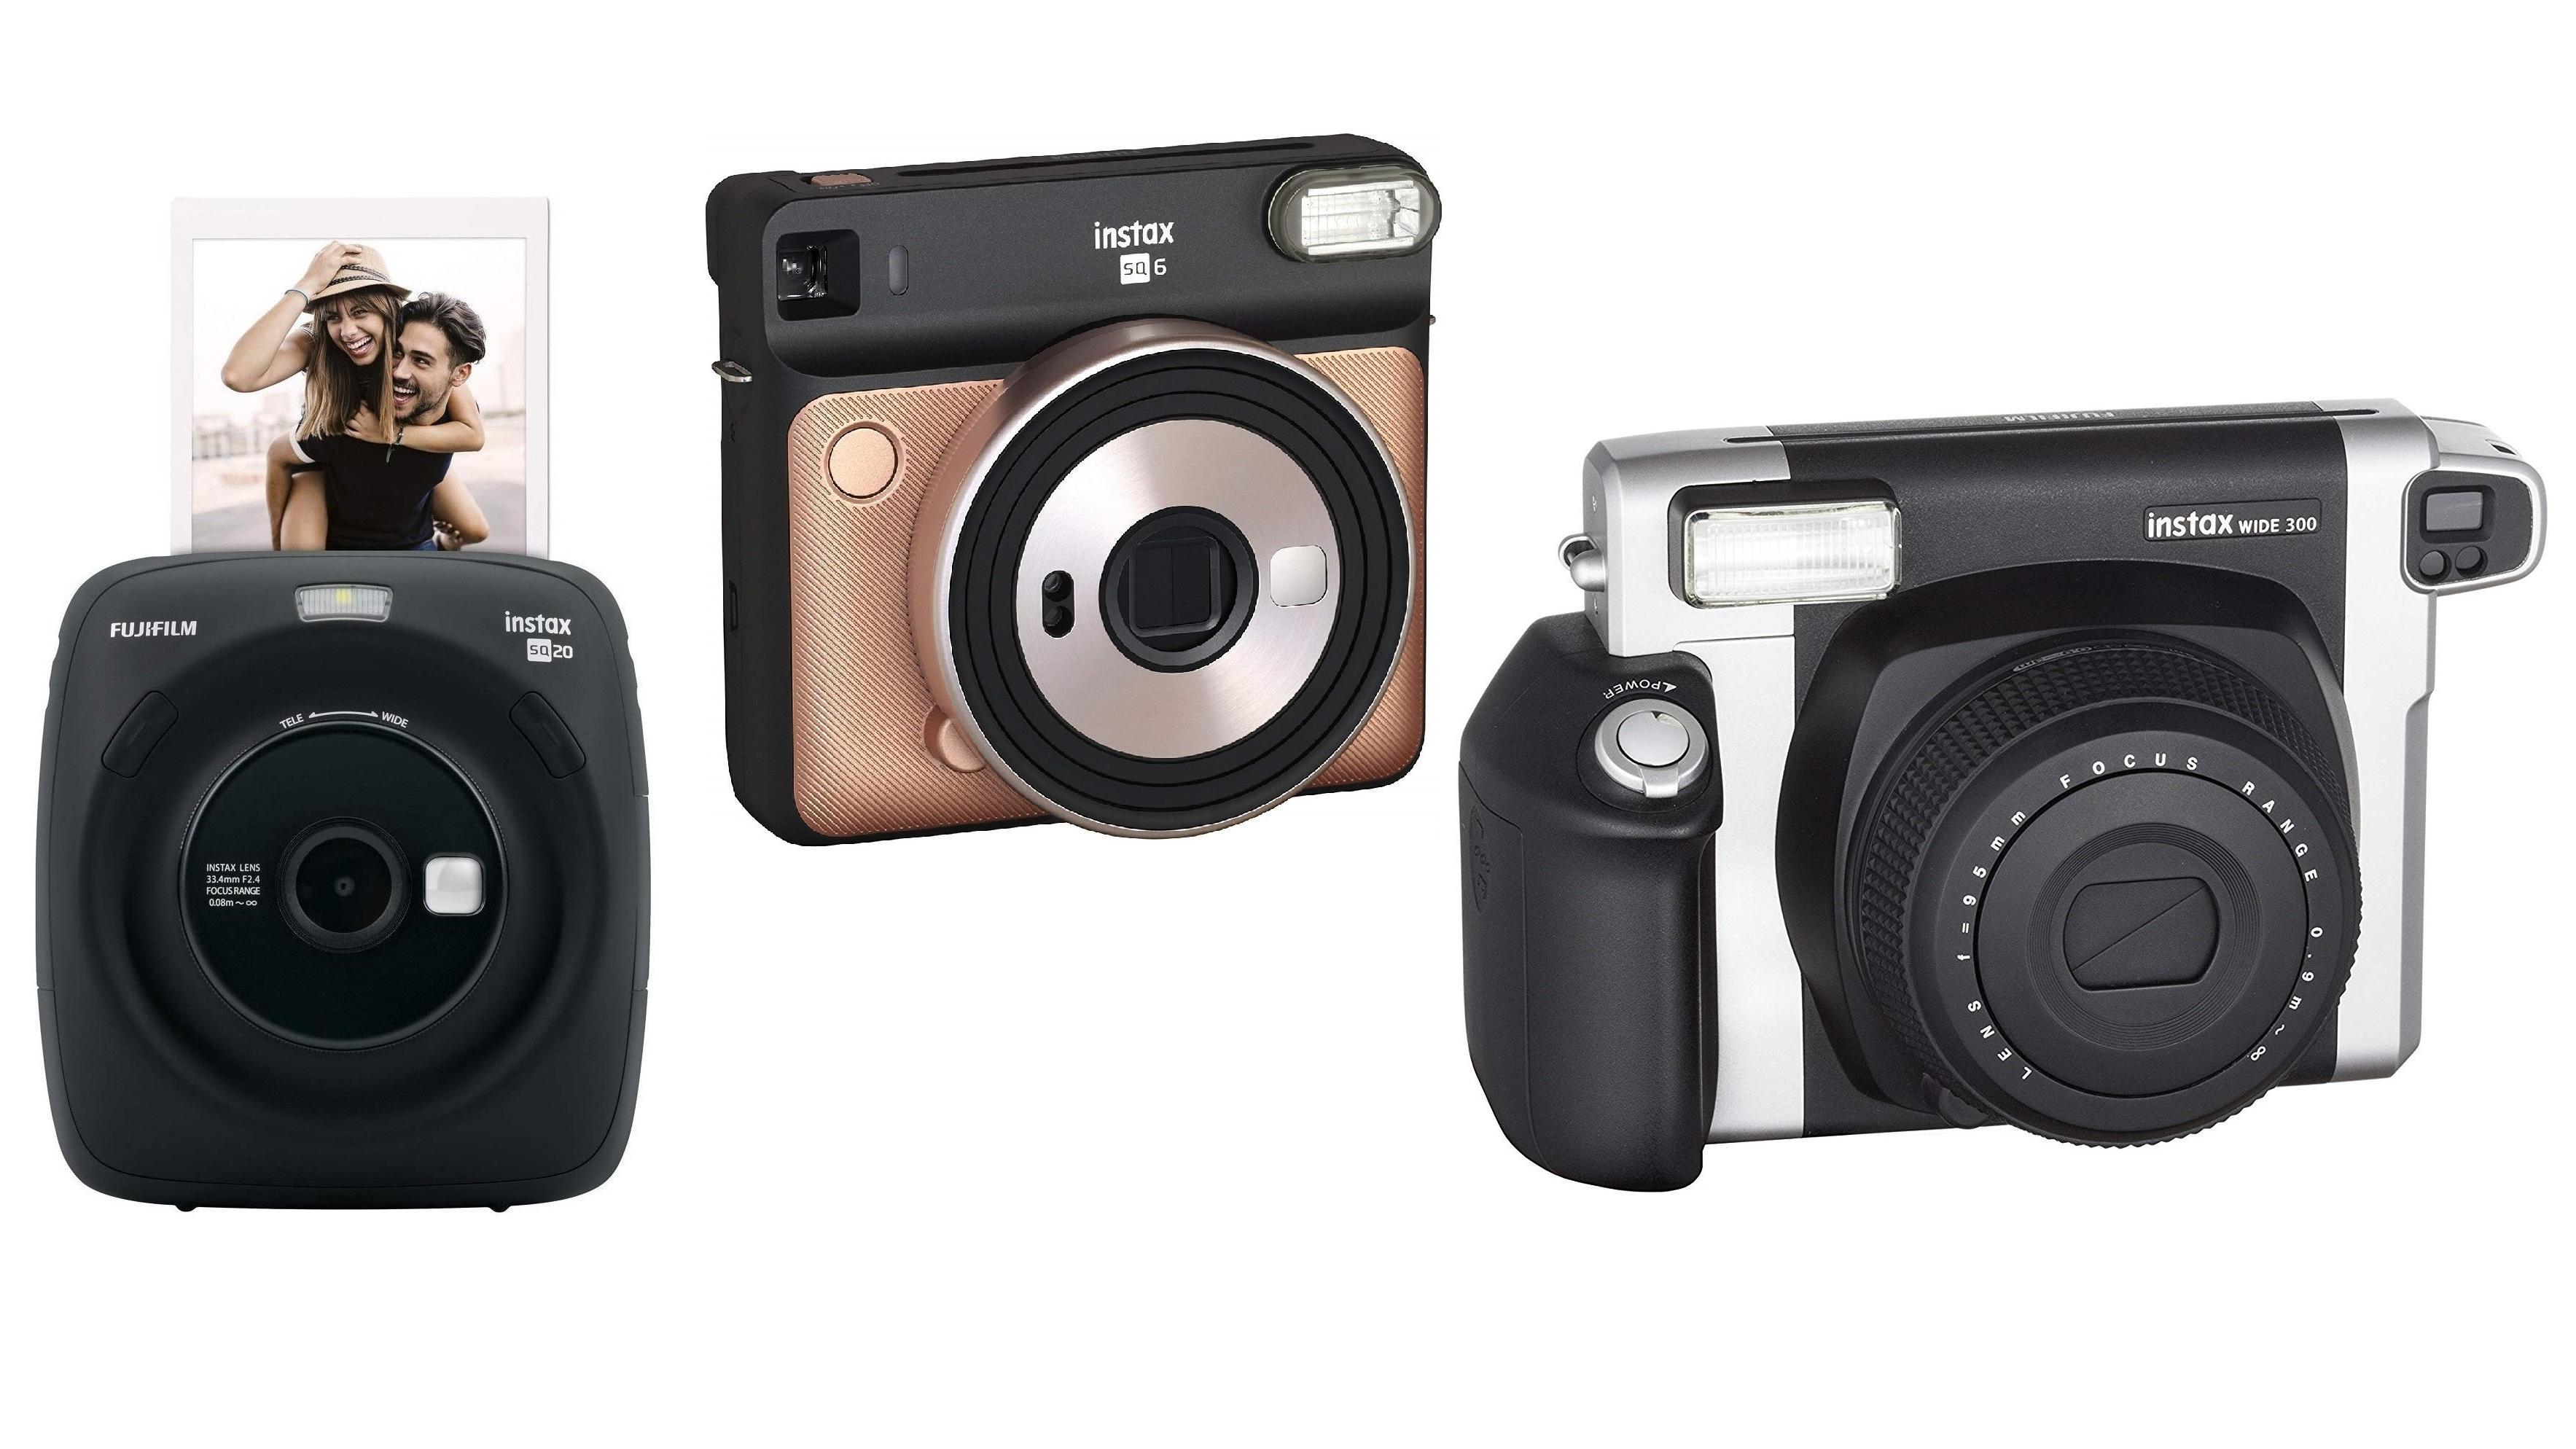 Sofortbildkamera Test 2021: Polaroid Kamera & Co. im Vergleich